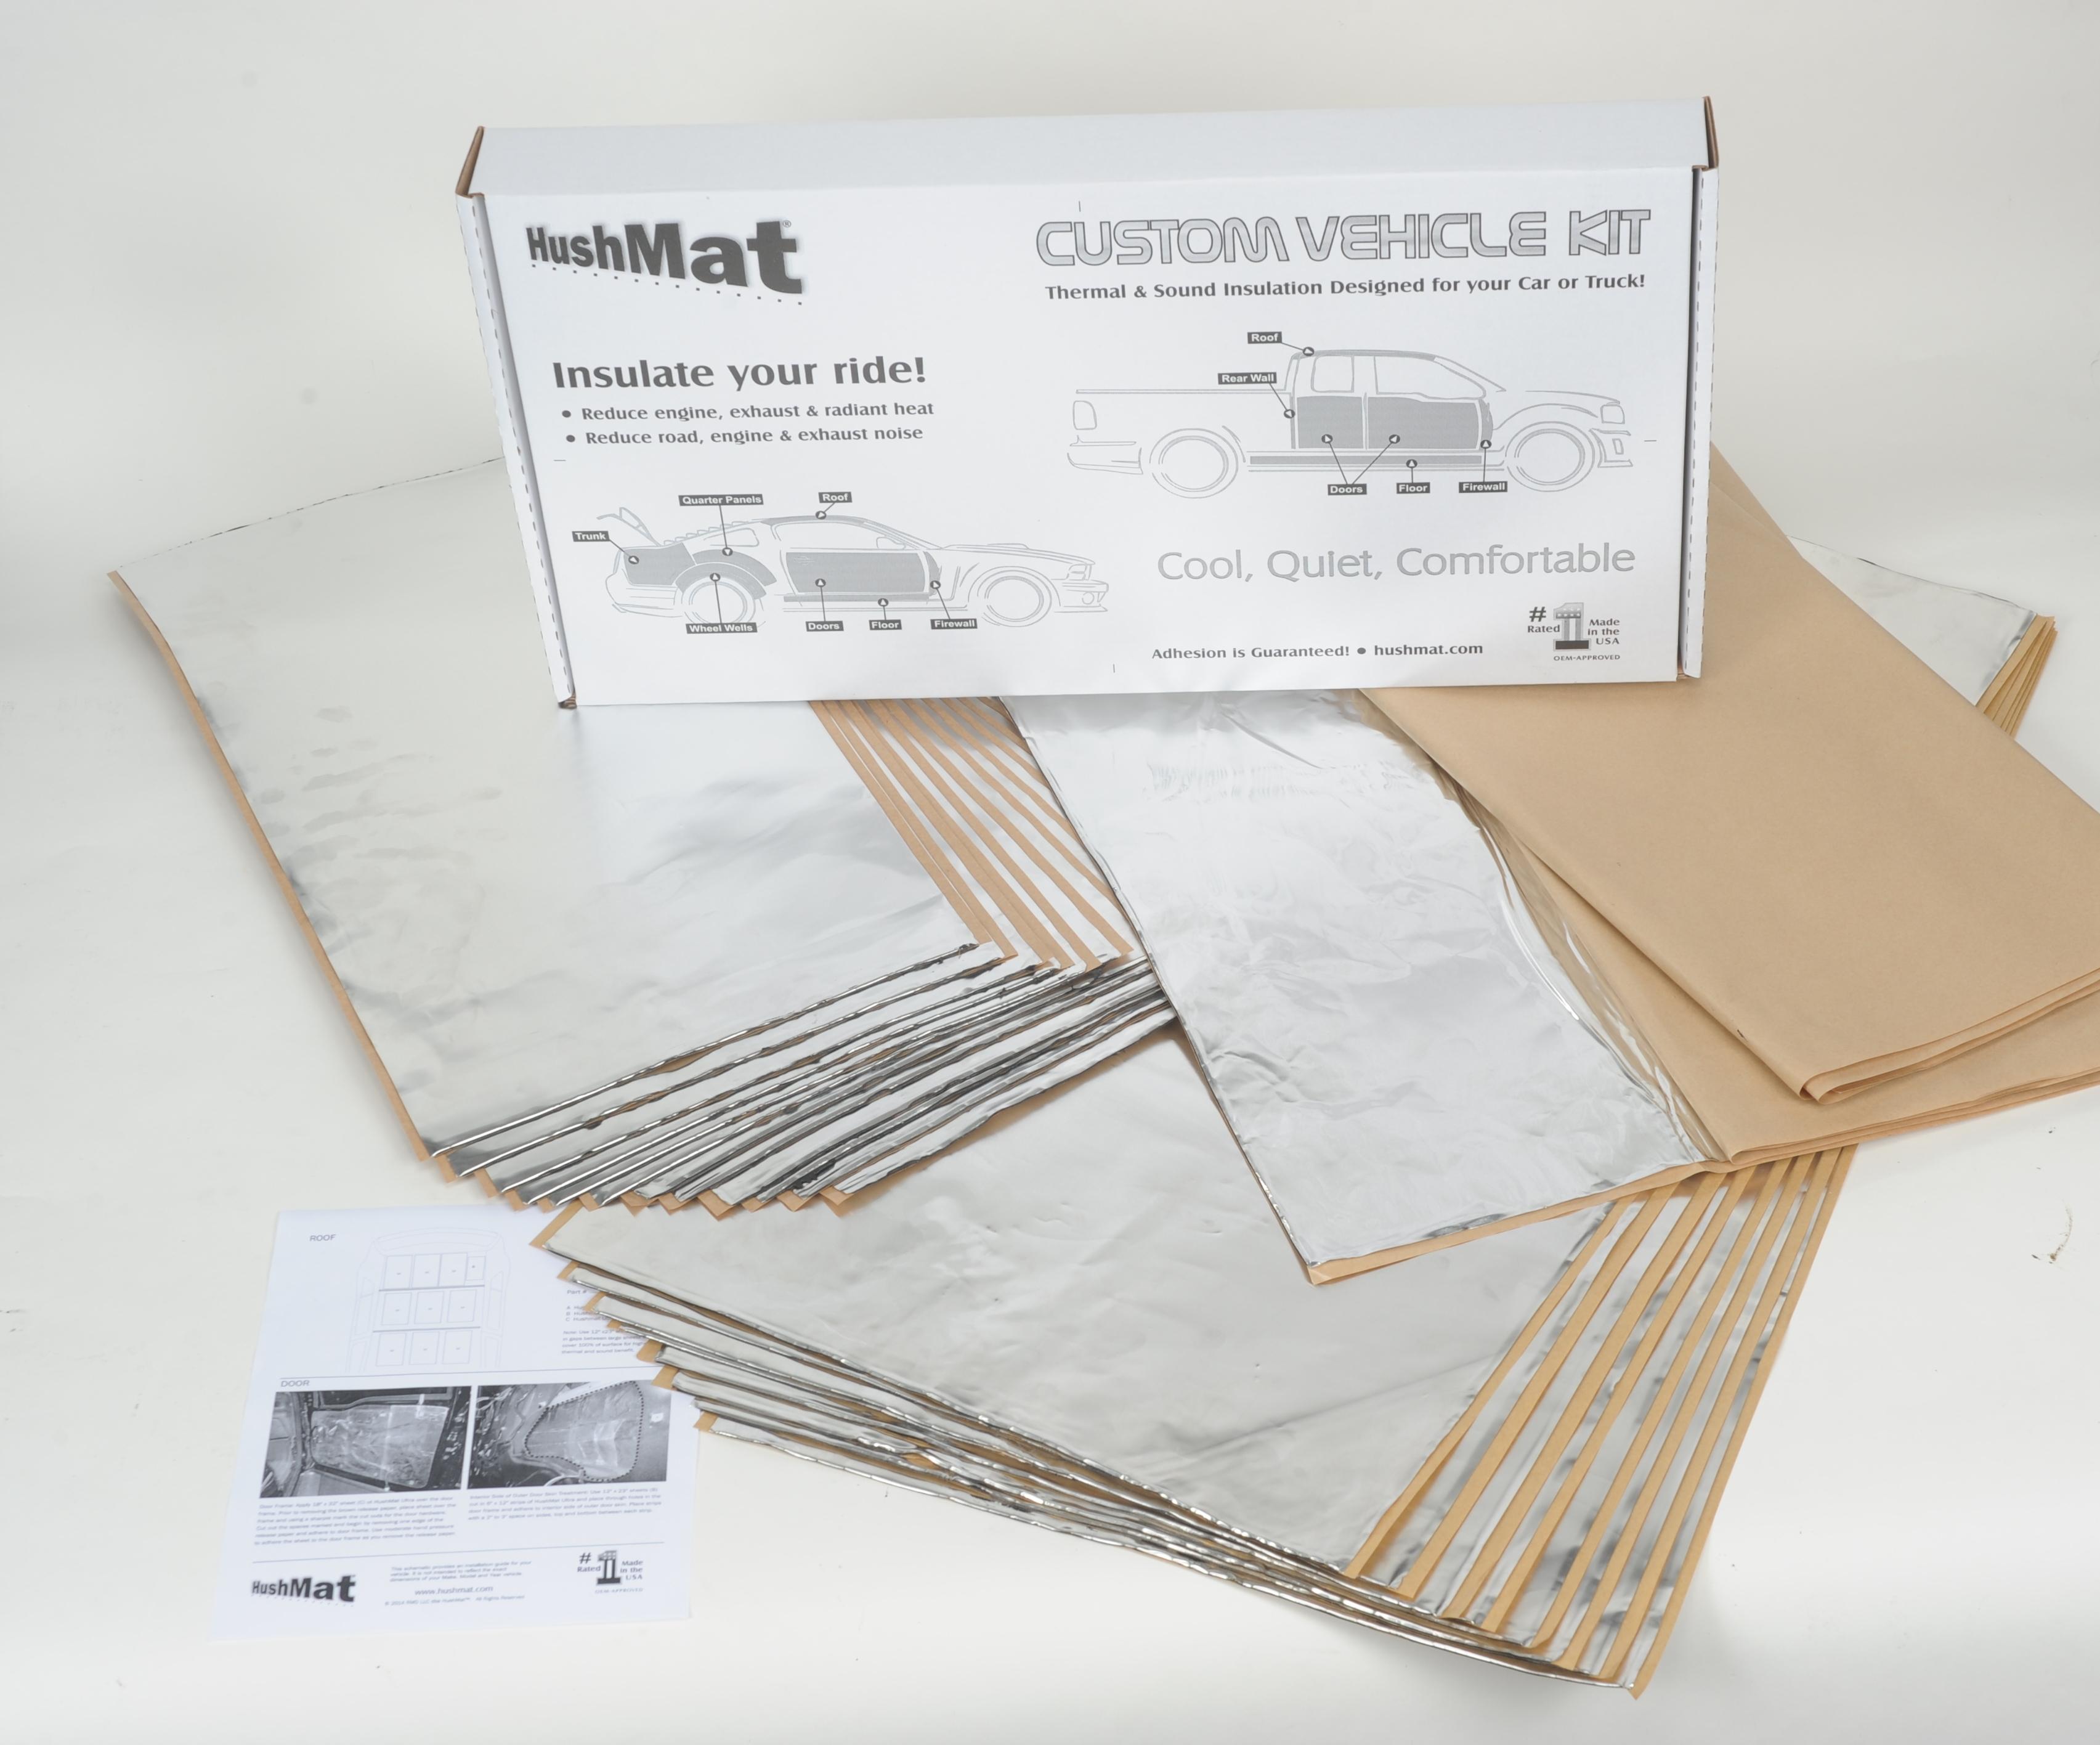 Hushmat 58030 Complete Vehicle Custom Insulation Kit